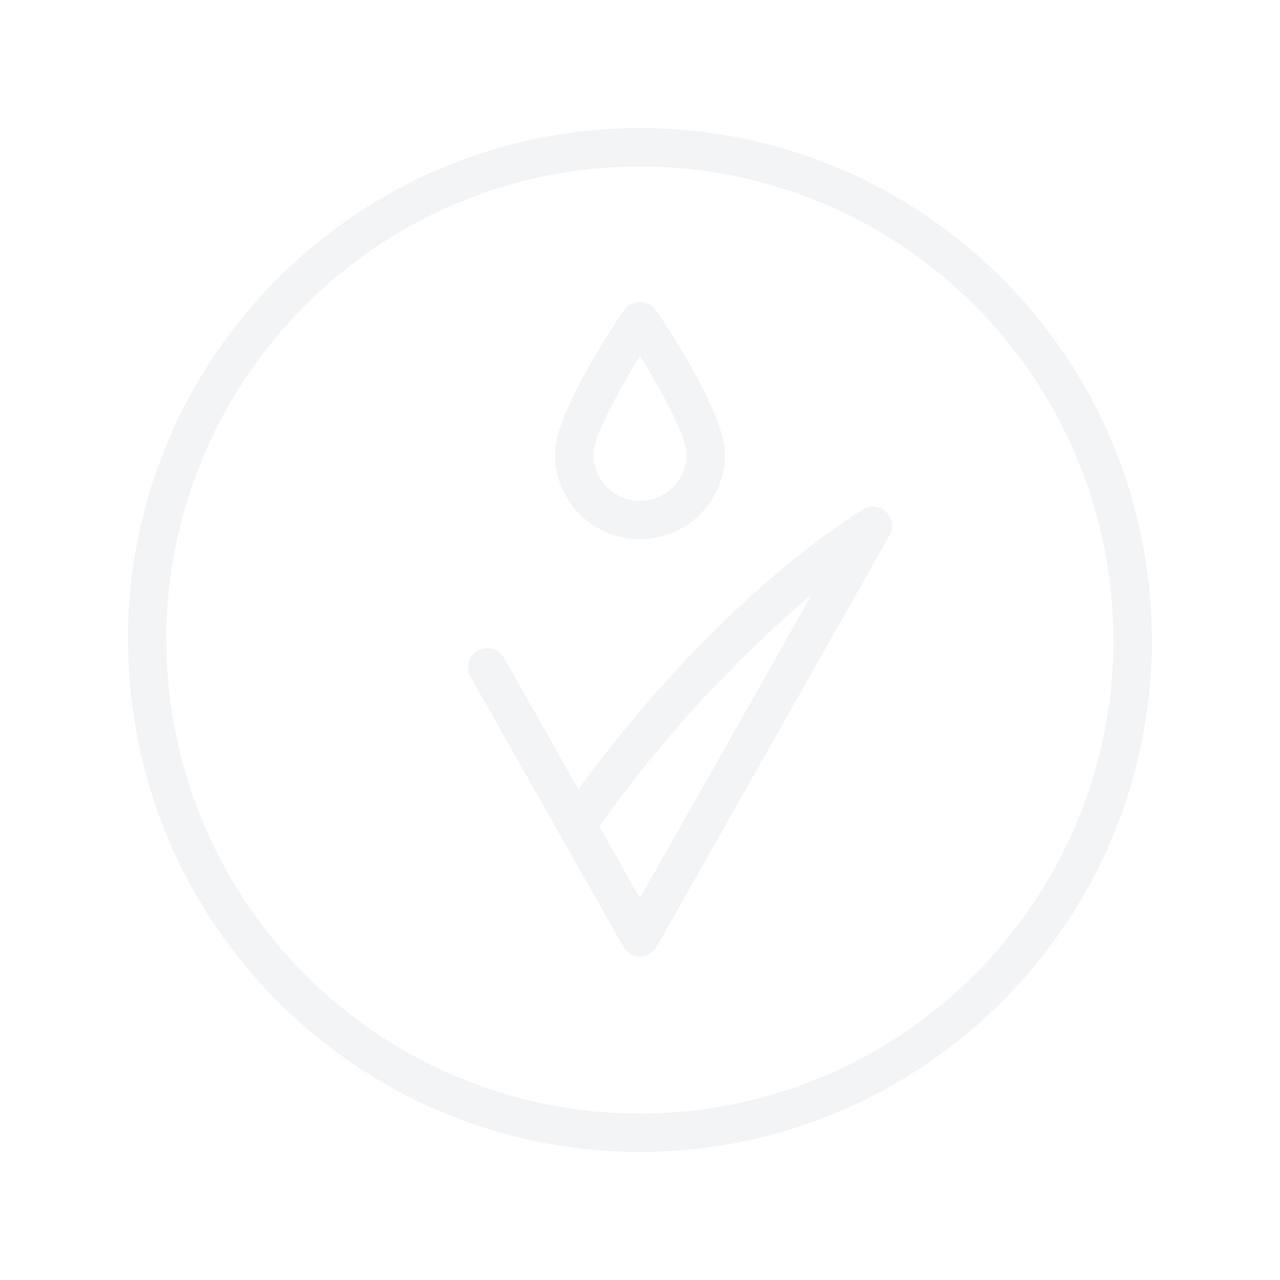 HOLIKA HOLIKA Aloe Soothing Essence Waterproof Sun Gel SPF50 100ml